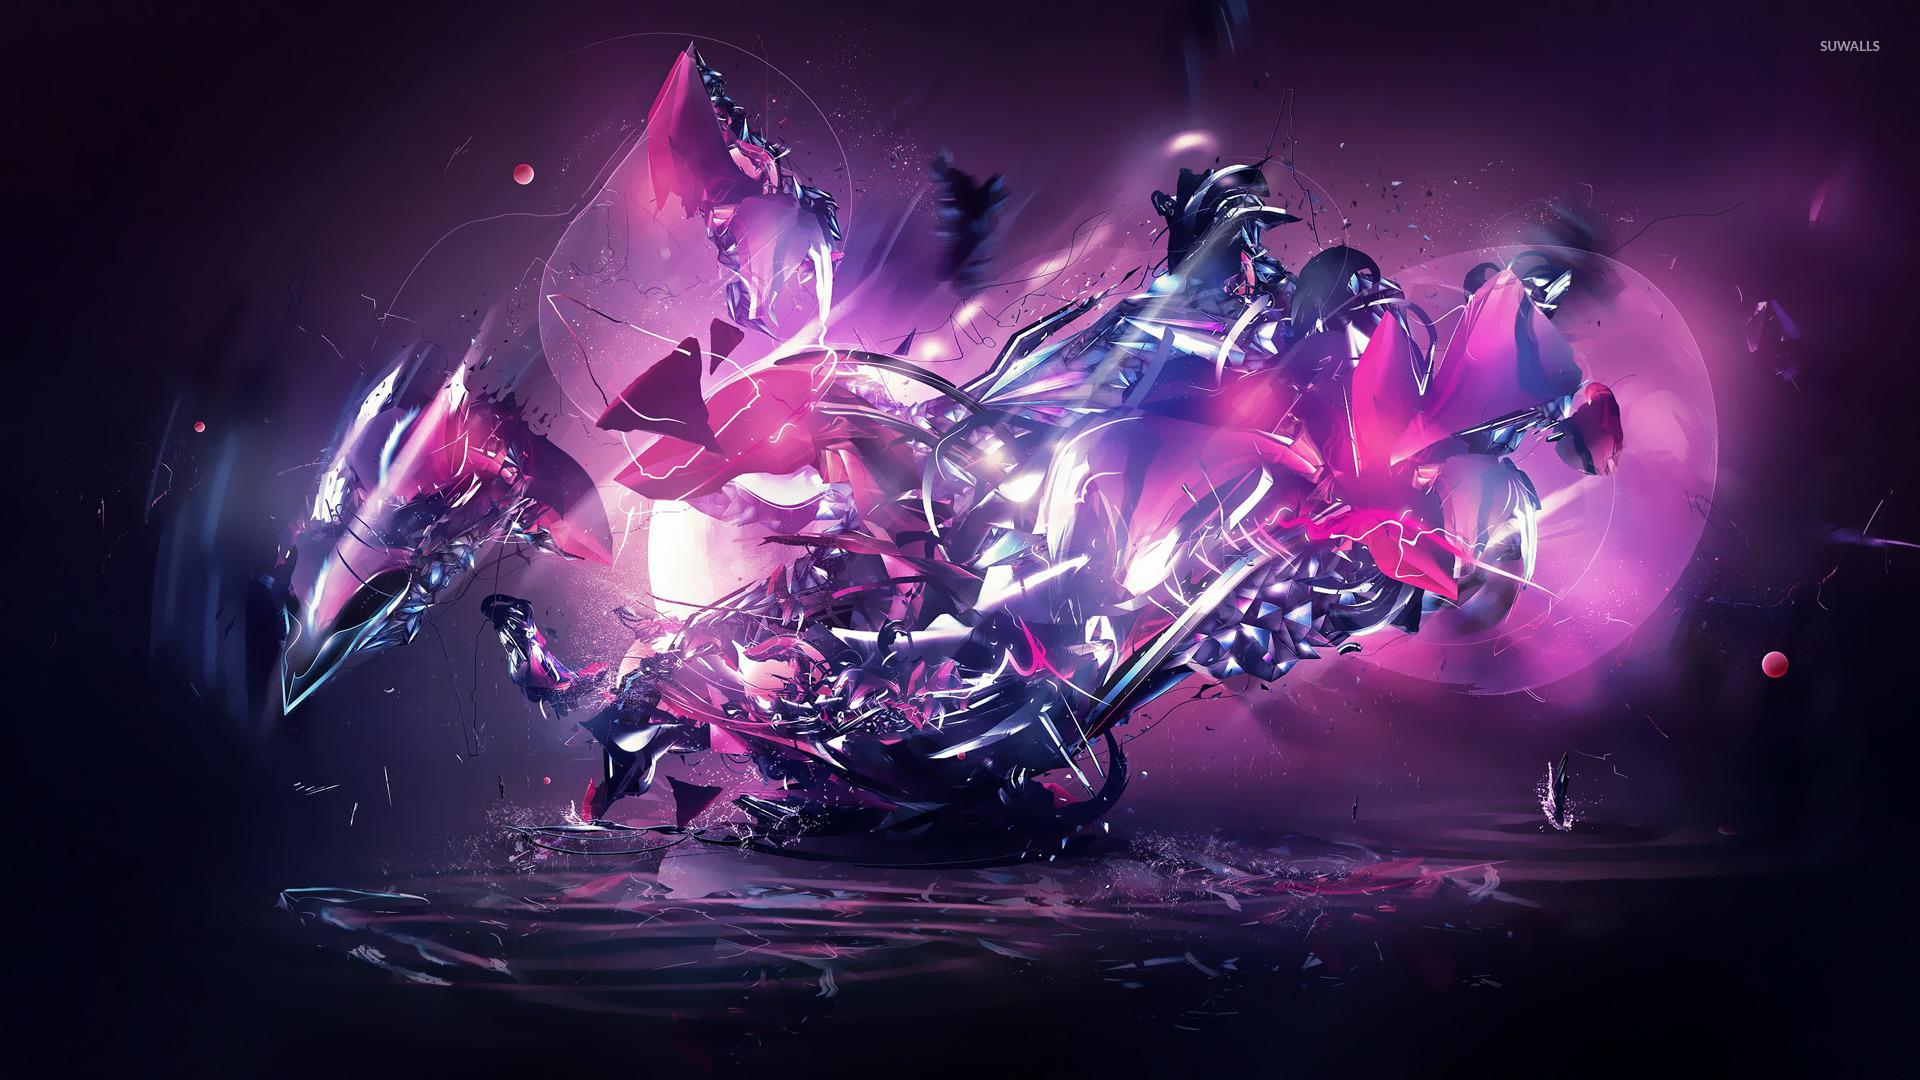 Must see Wallpaper Abstract Dragon - dragon-splash-15662-1920x1080  Snapshot_356970 .jpg